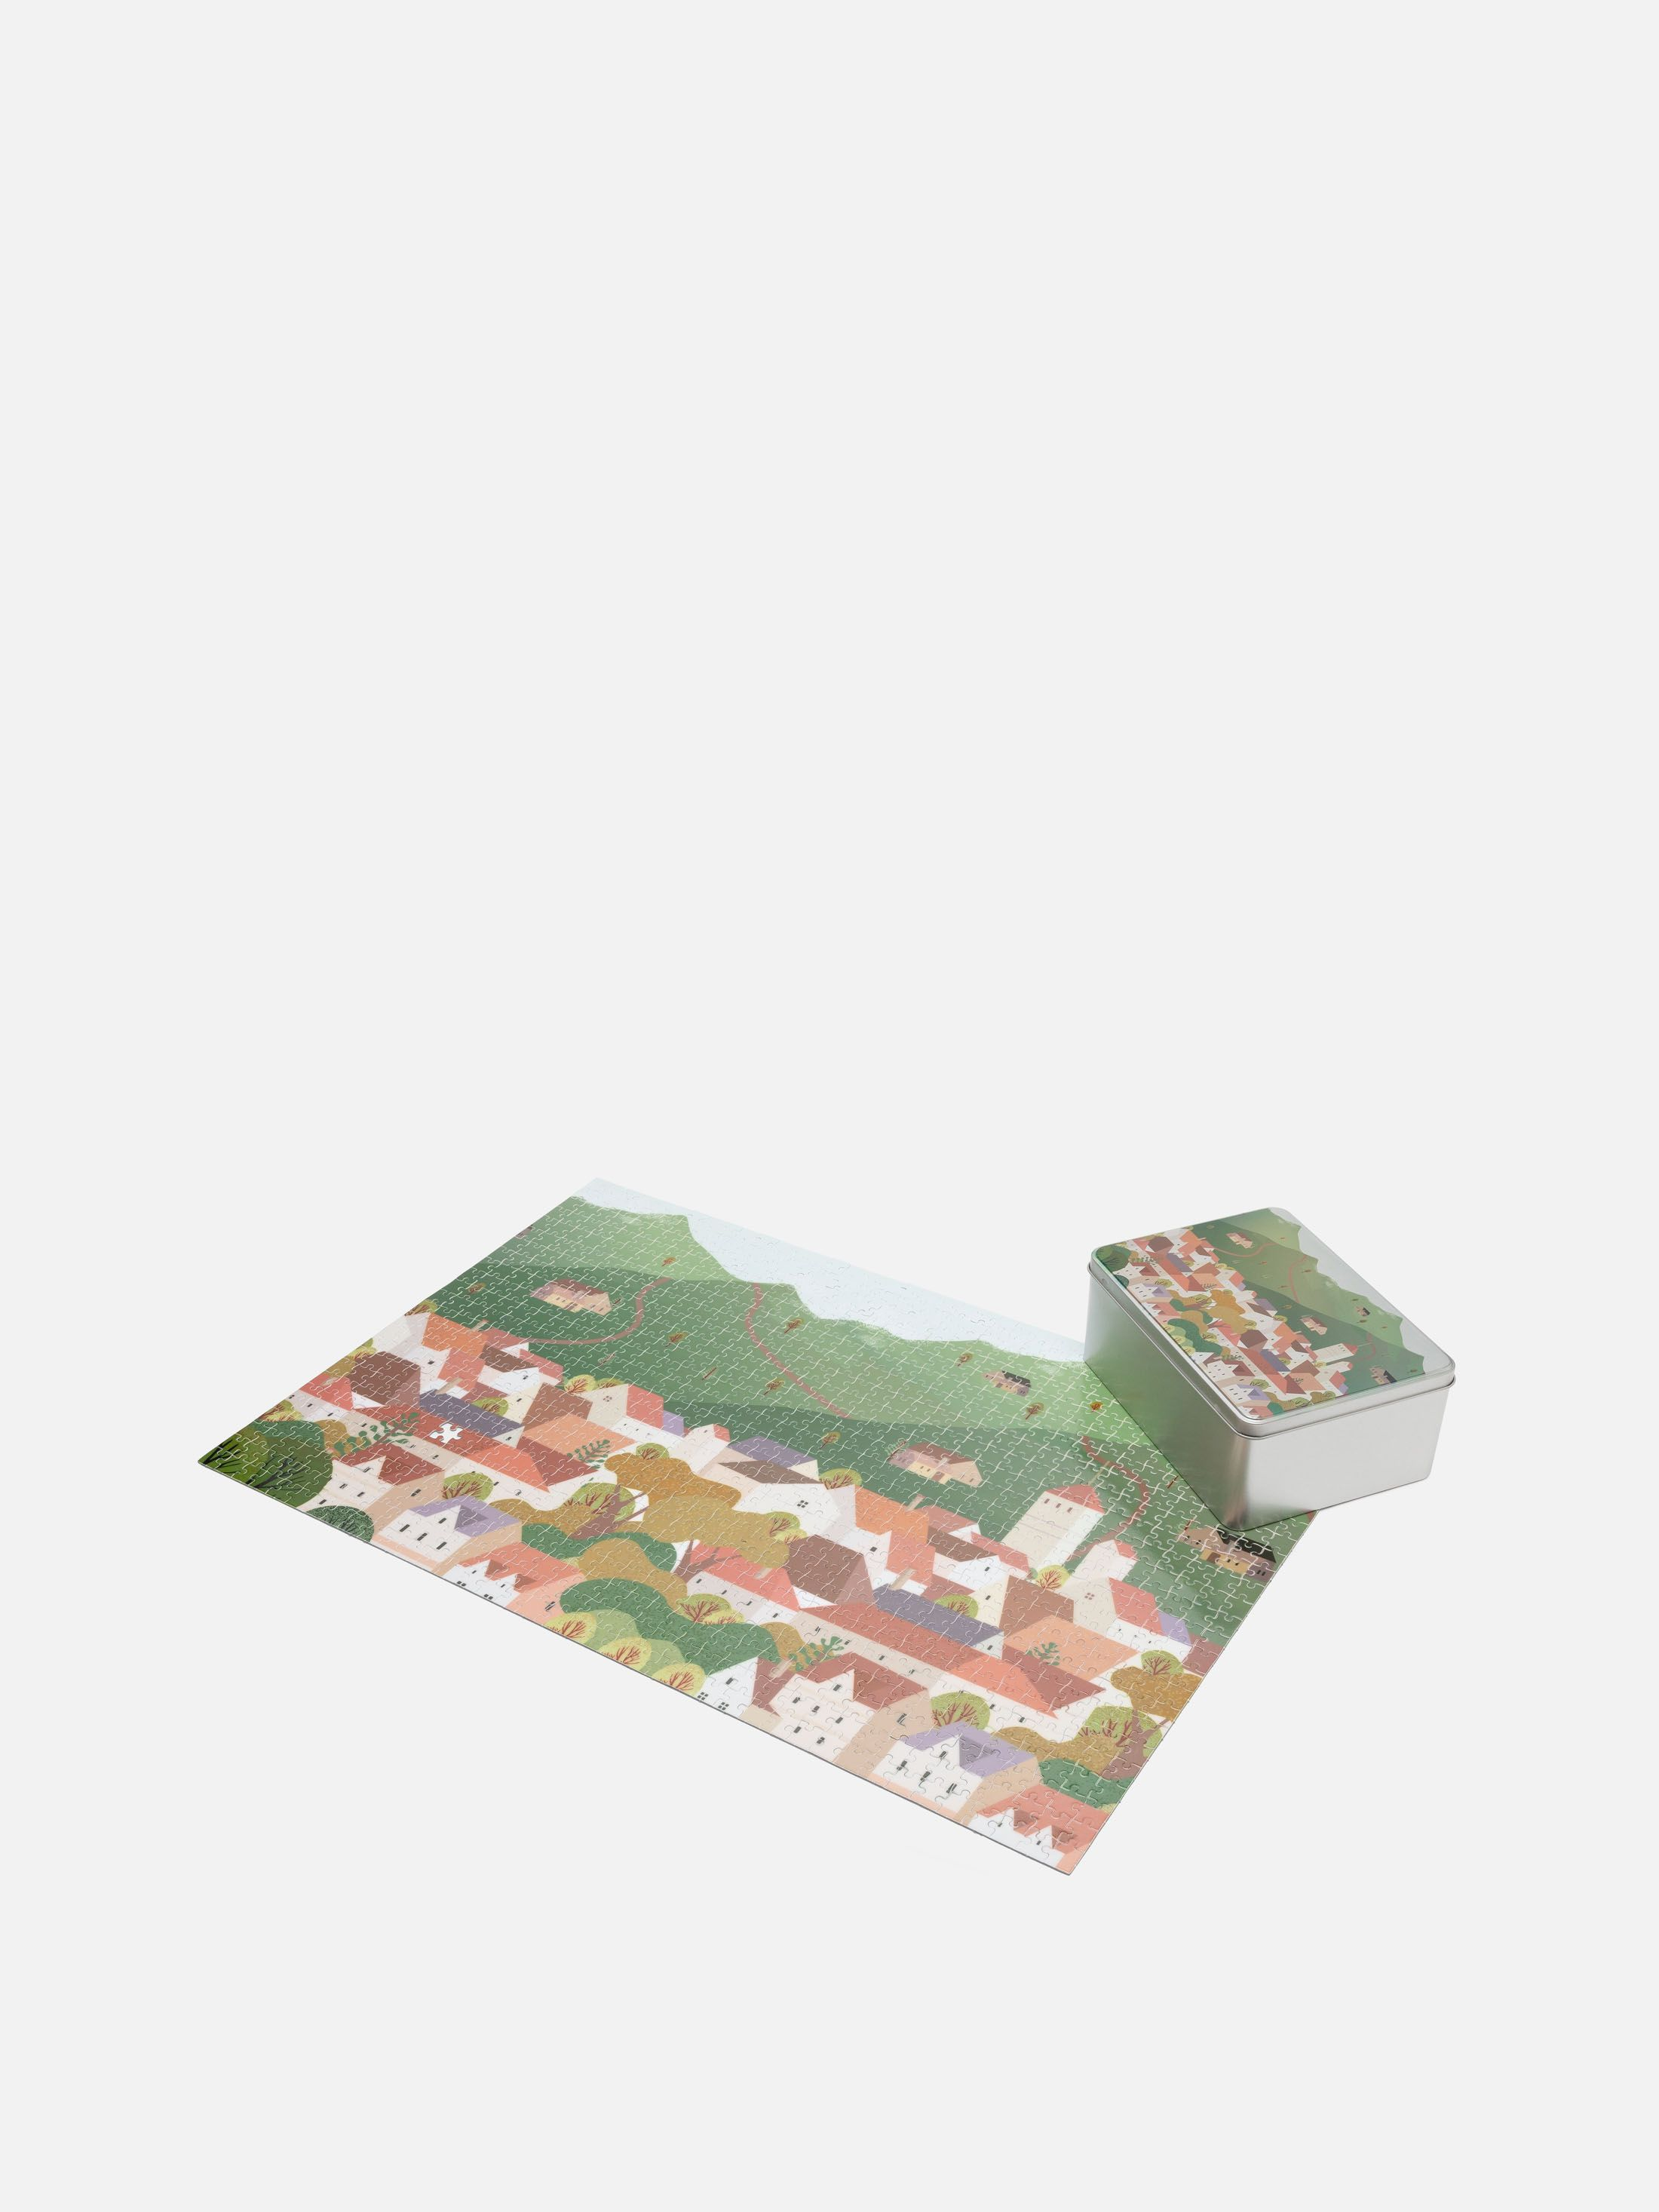 Design your own jigsaw